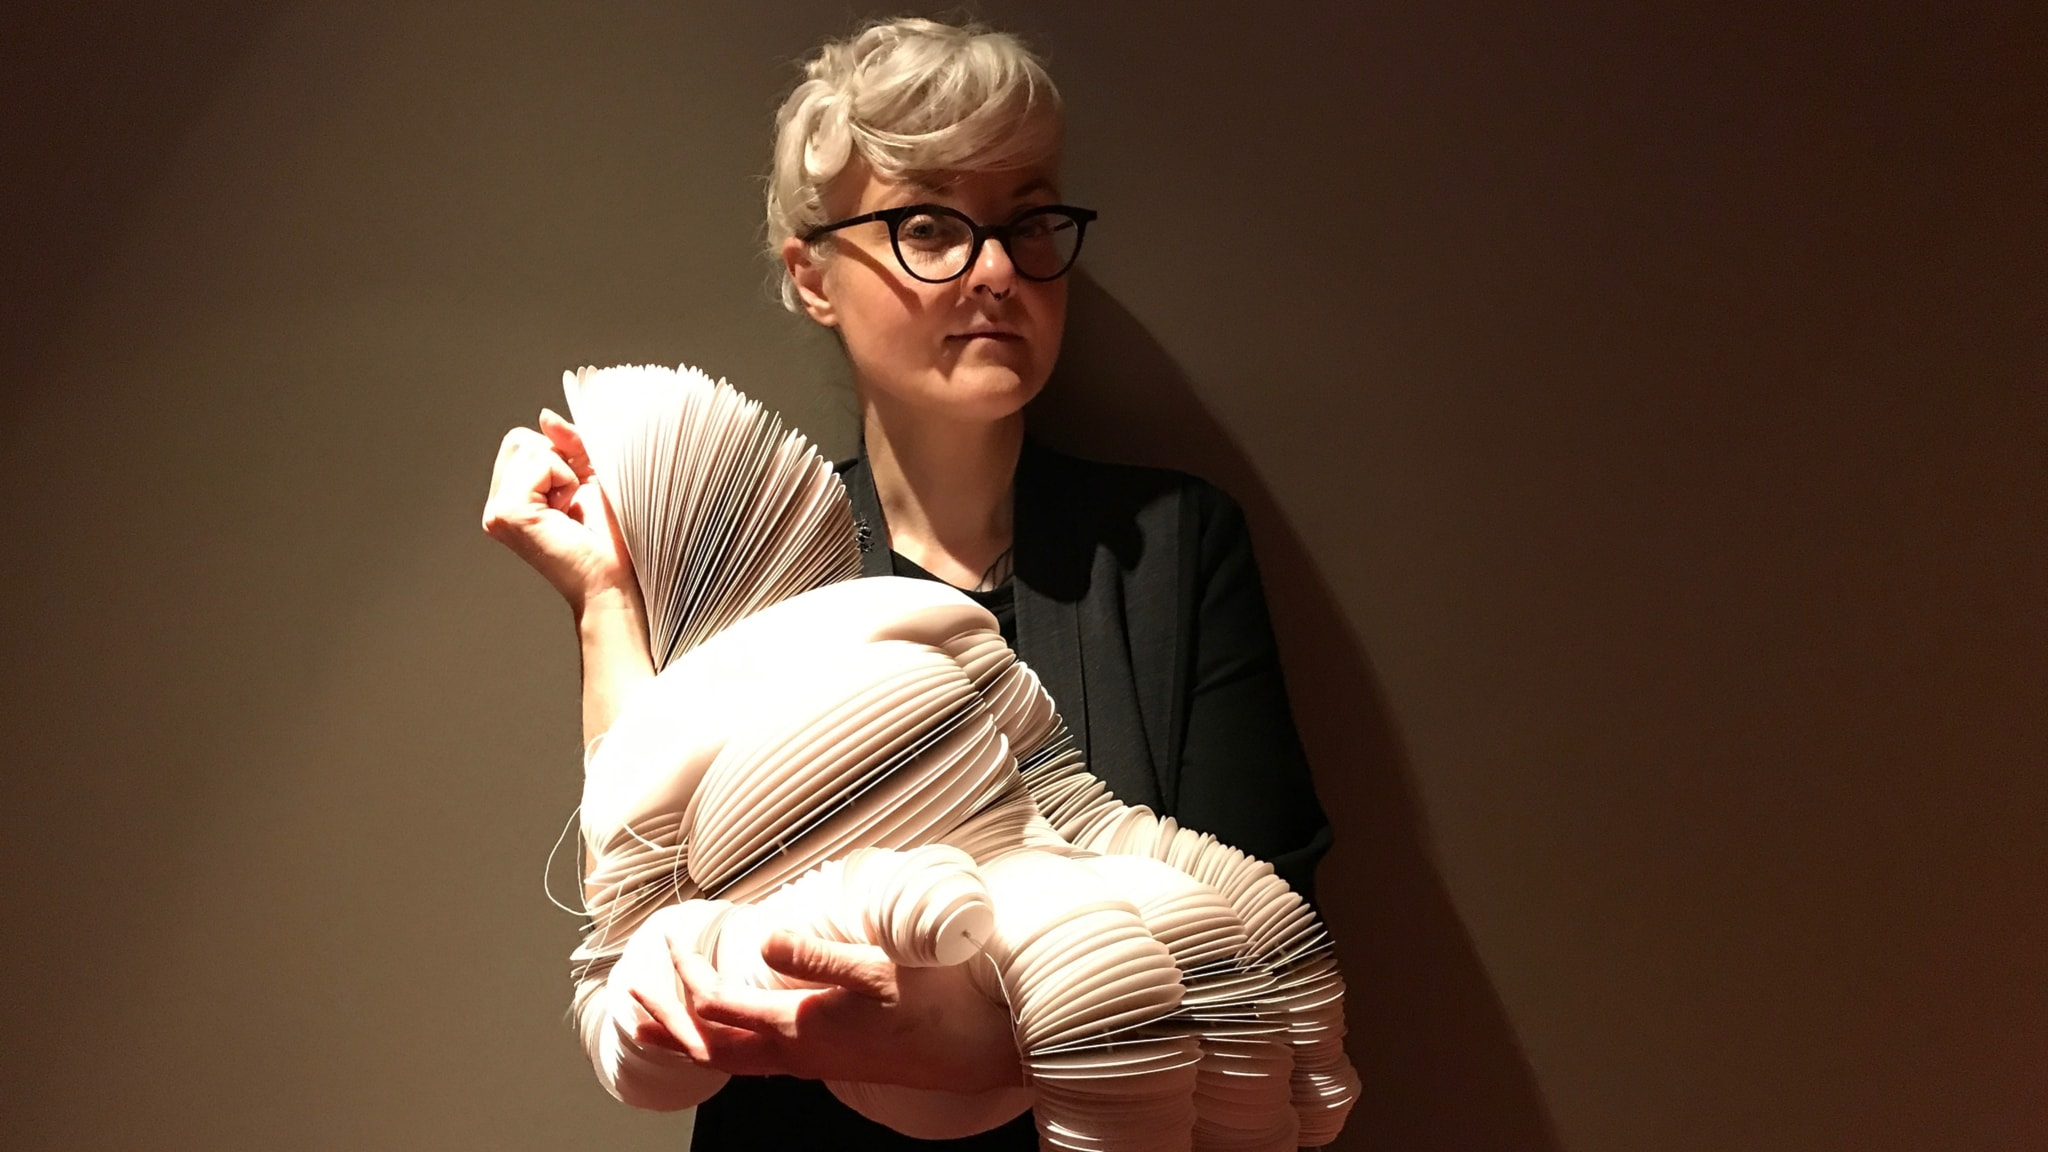 Bea Szenfeld: Mina plagg kan väga 30-40 kg